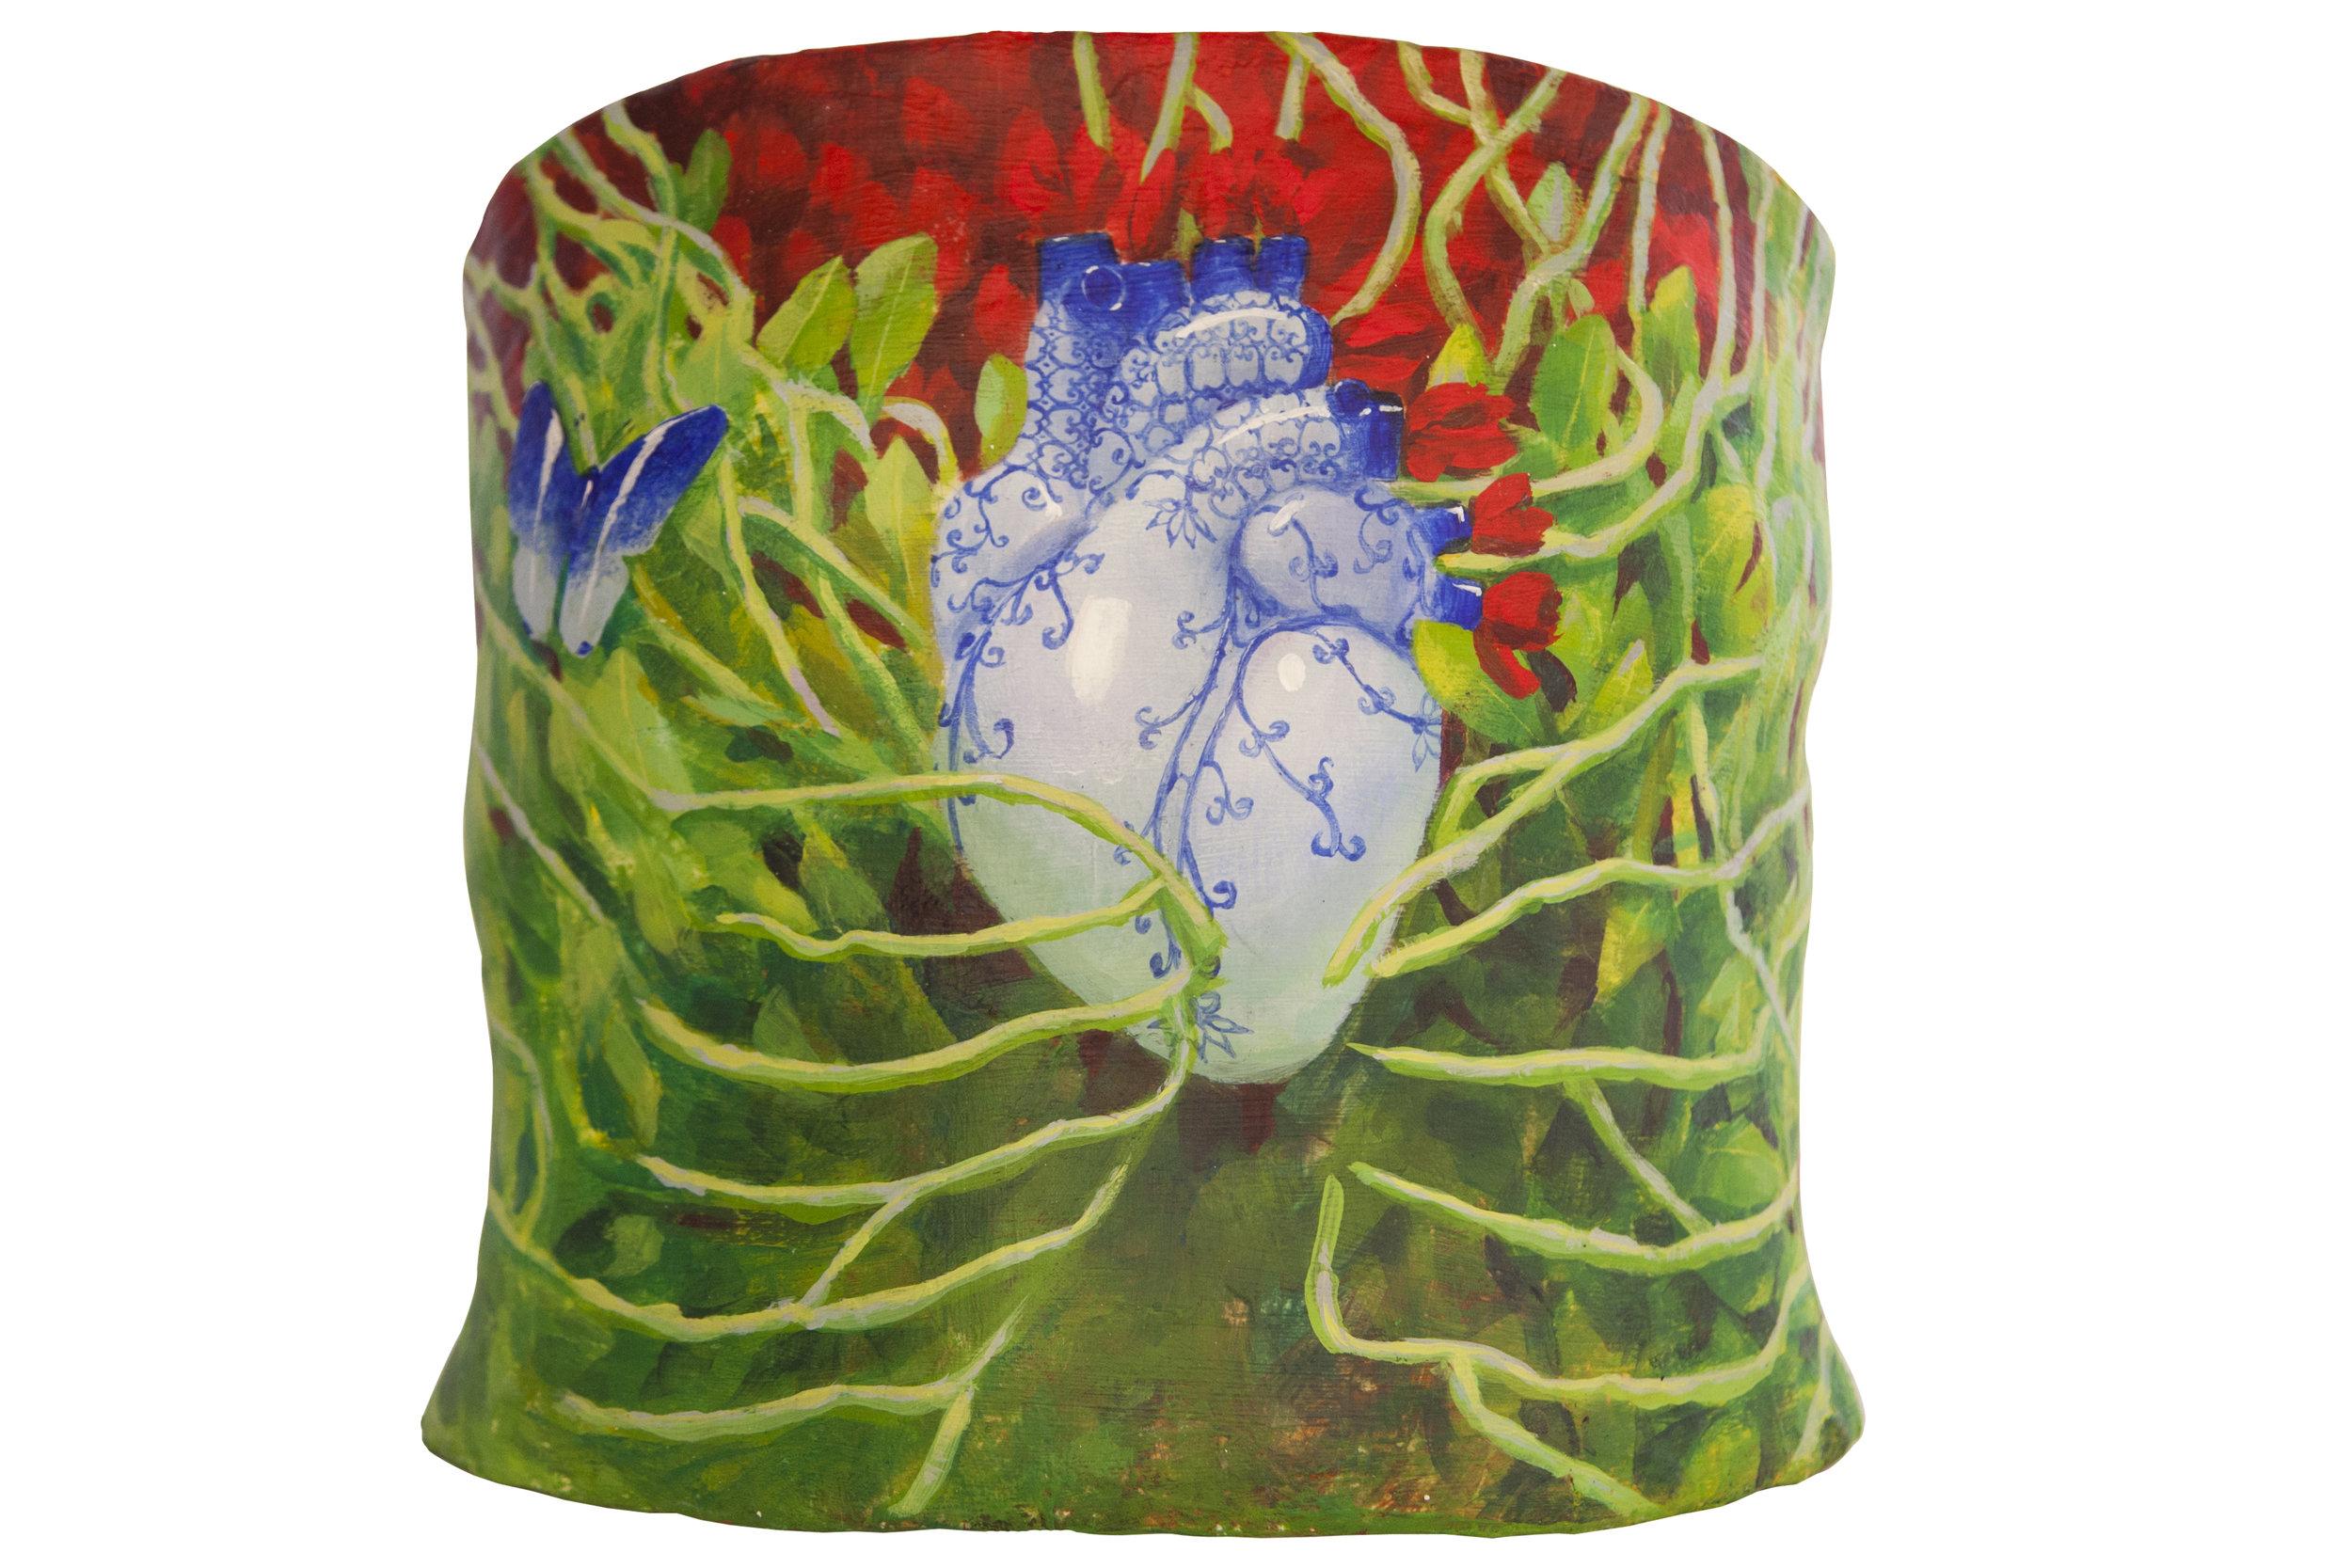 ARTIST: BAO PHAM | CASTEE: JENNA HOLLAND